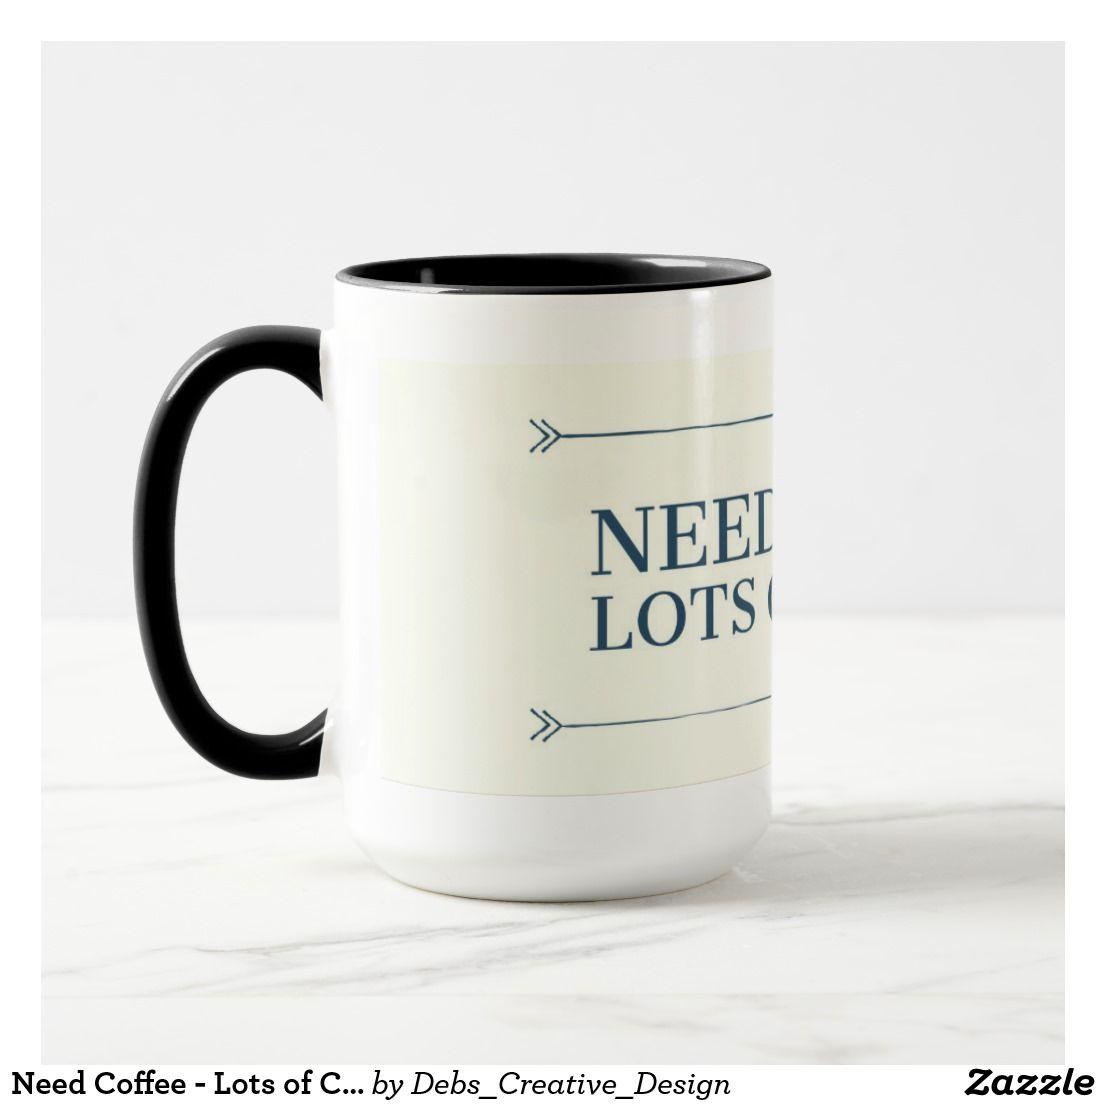 Need Coffee Lots of Coffee Mug (With images